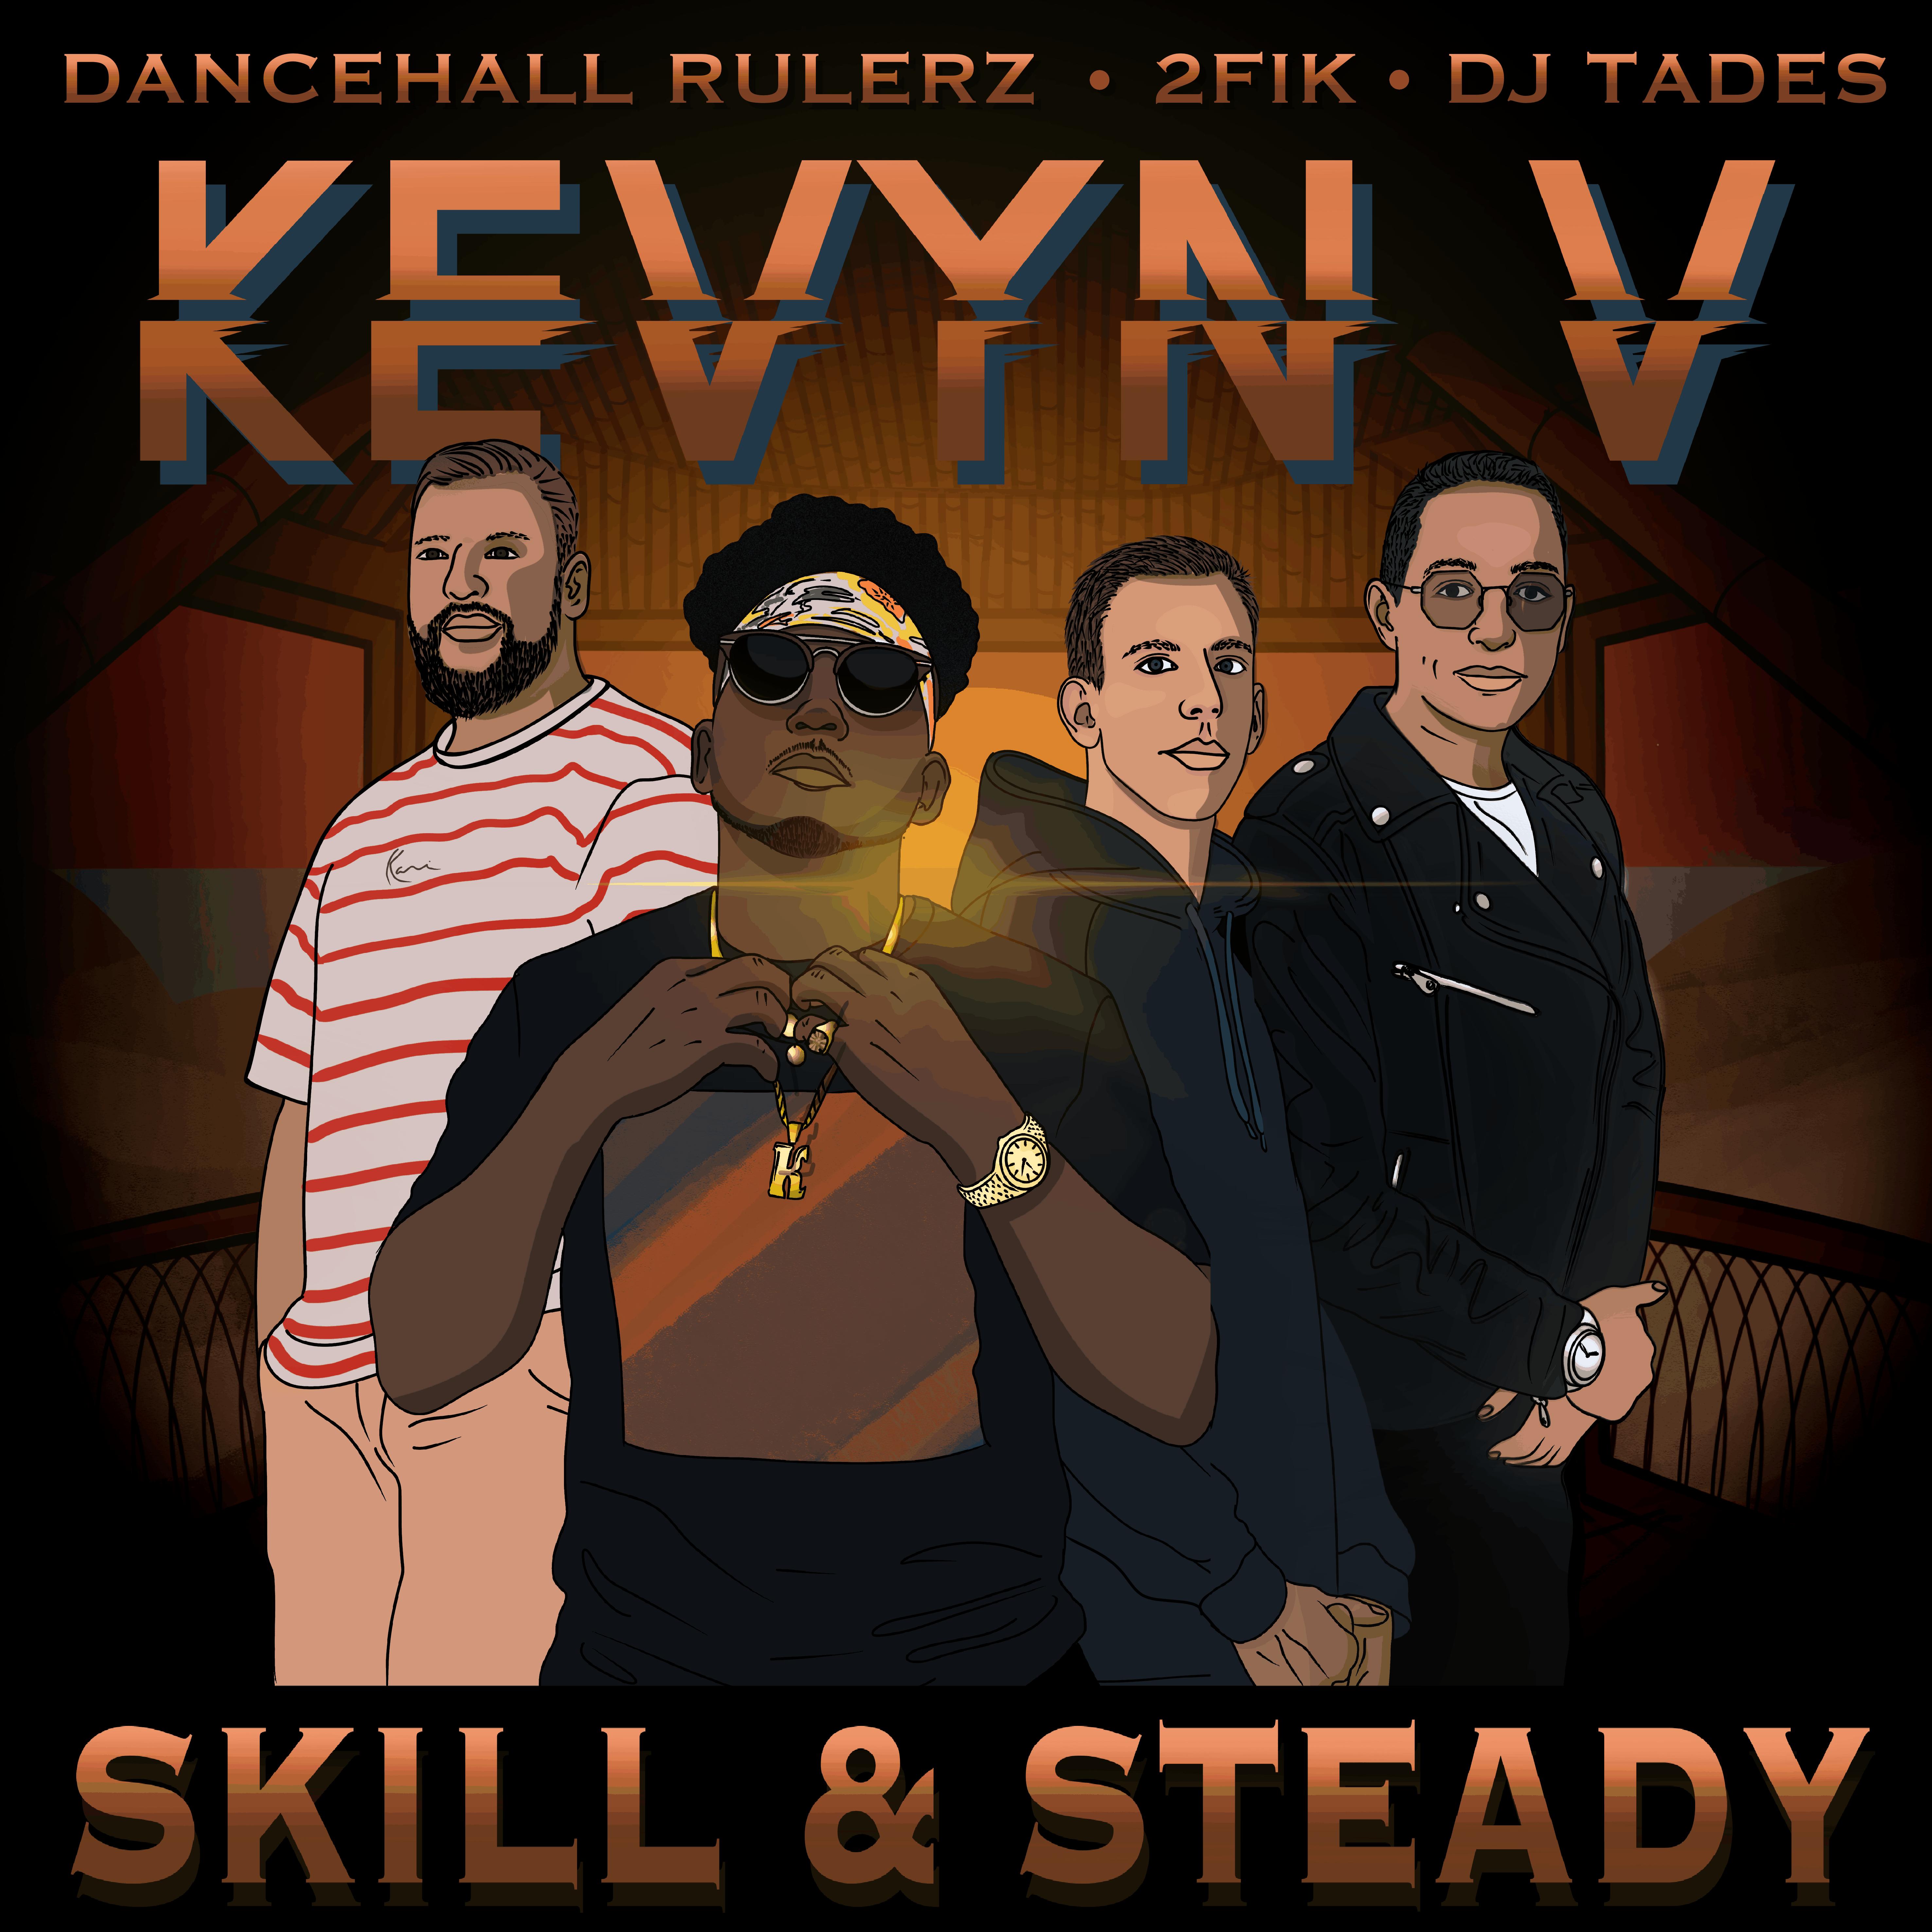 Skill & Steady - Kevyn V, DancehallRulerz & 2Fik [feat. Dj Tades]